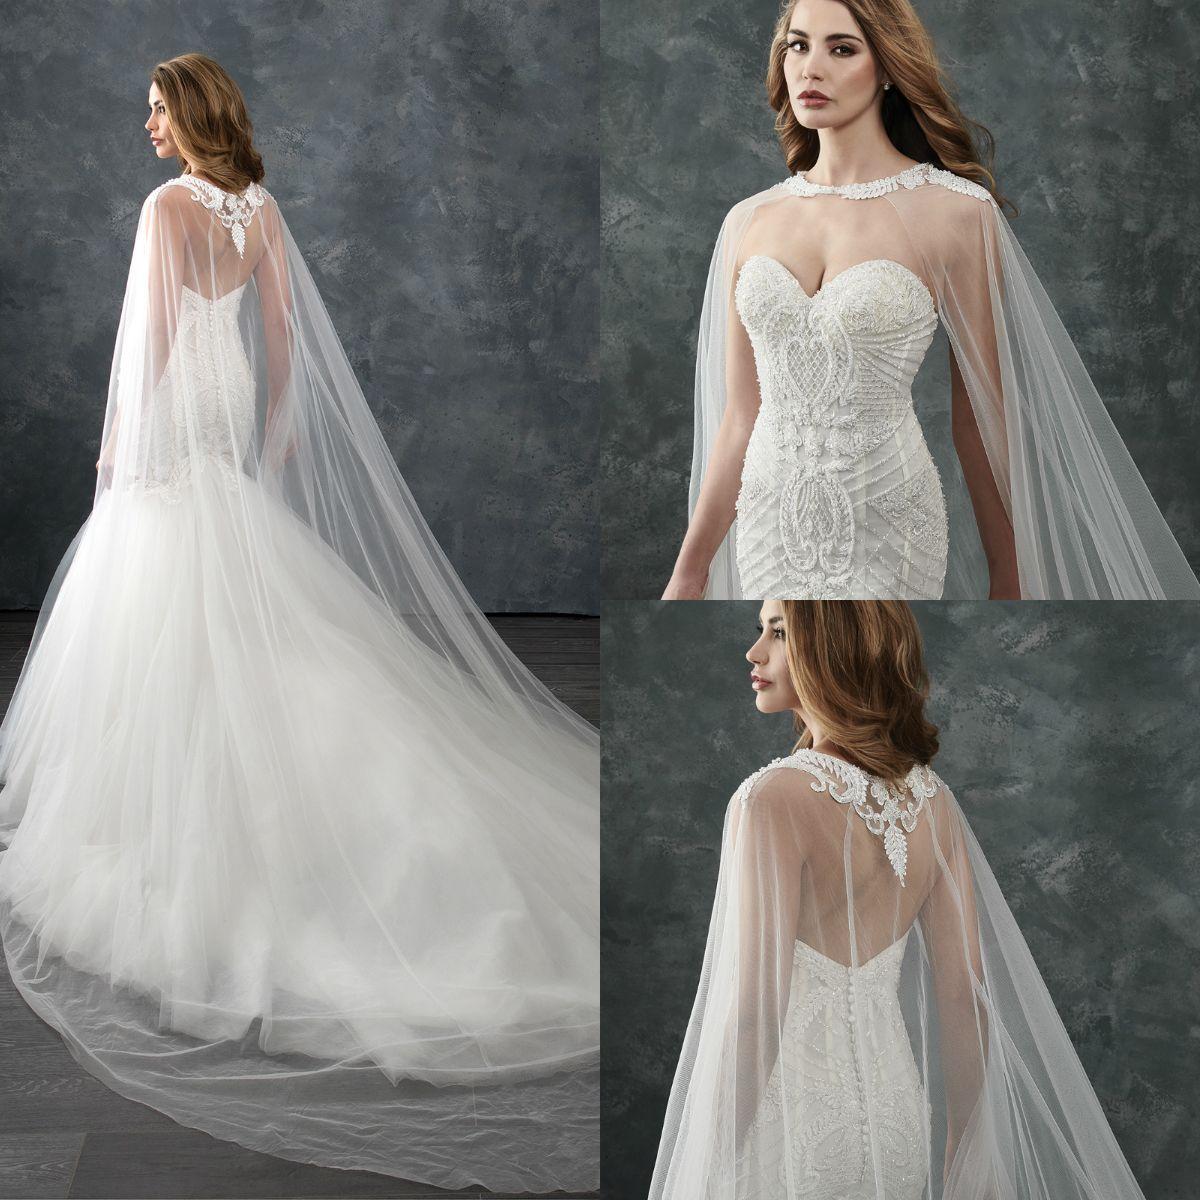 5248127962 Ivory Long Bridal Wraps Shawls Jewel Lace Applique Wedding Cloaks Jackets  Brides Boleros For Wedding Dresses Evening Party High Quality